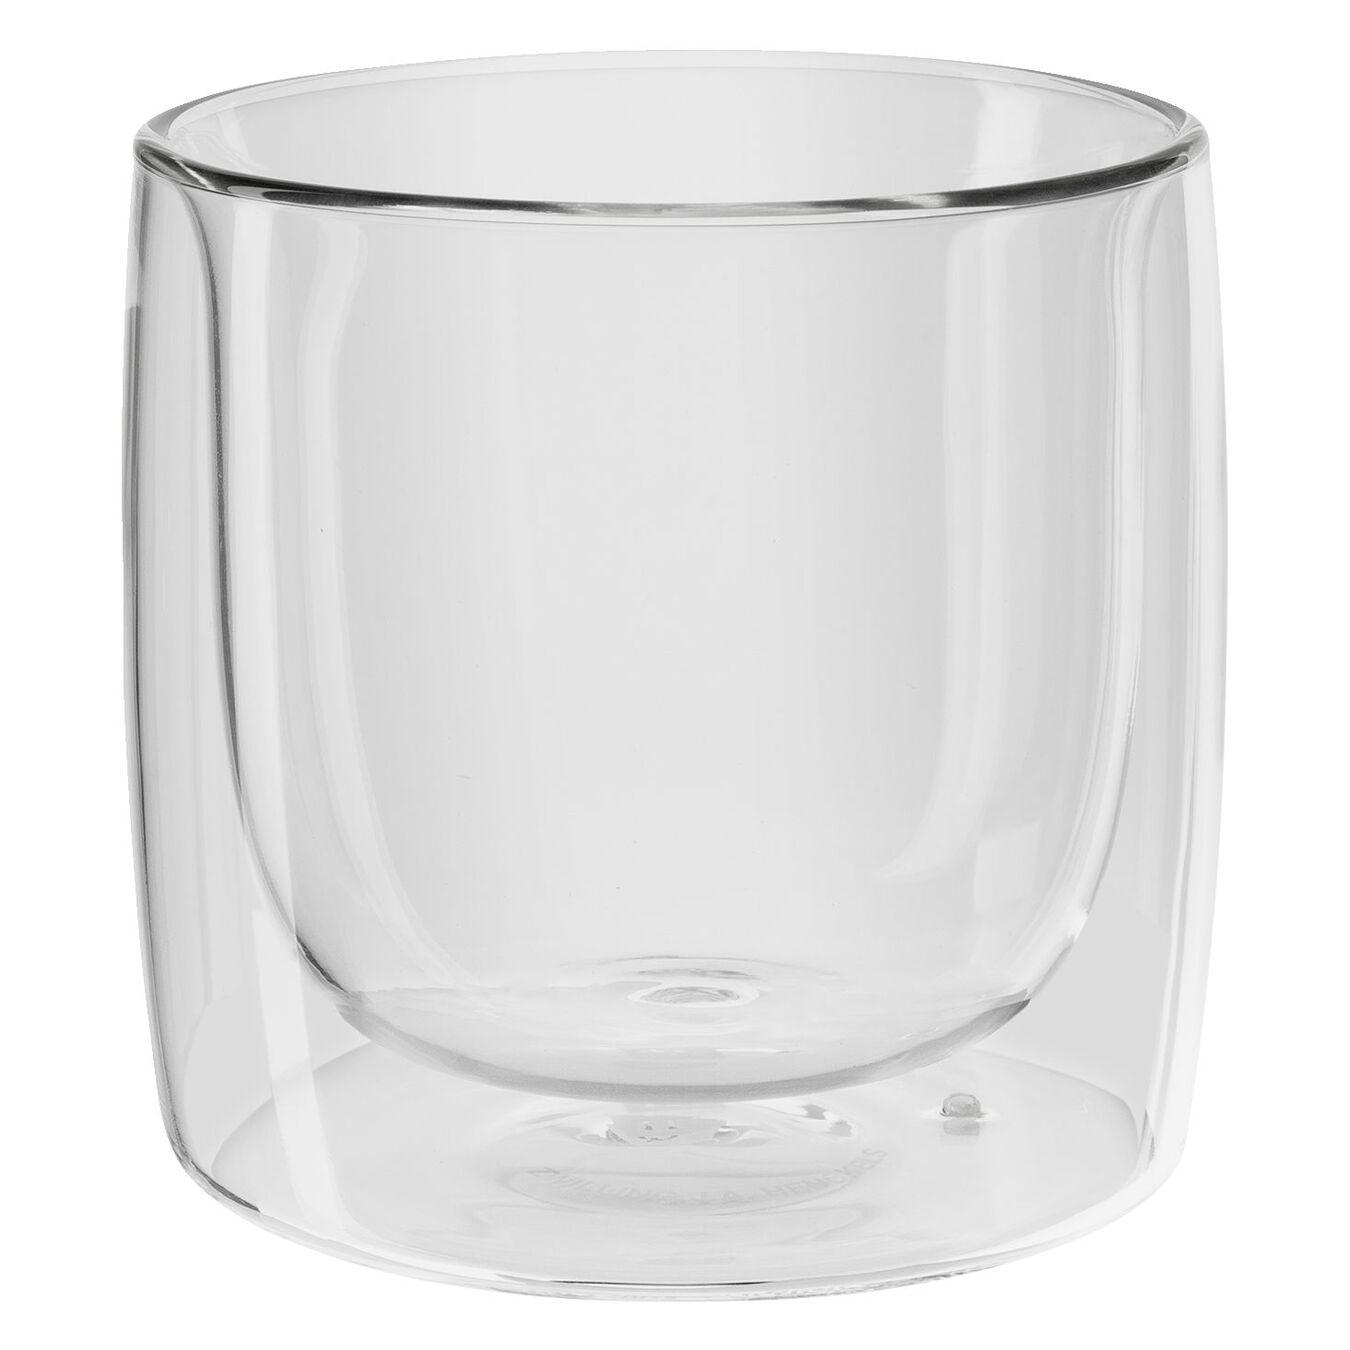 Viski Bardağı Seti | 2-parça,,large 1